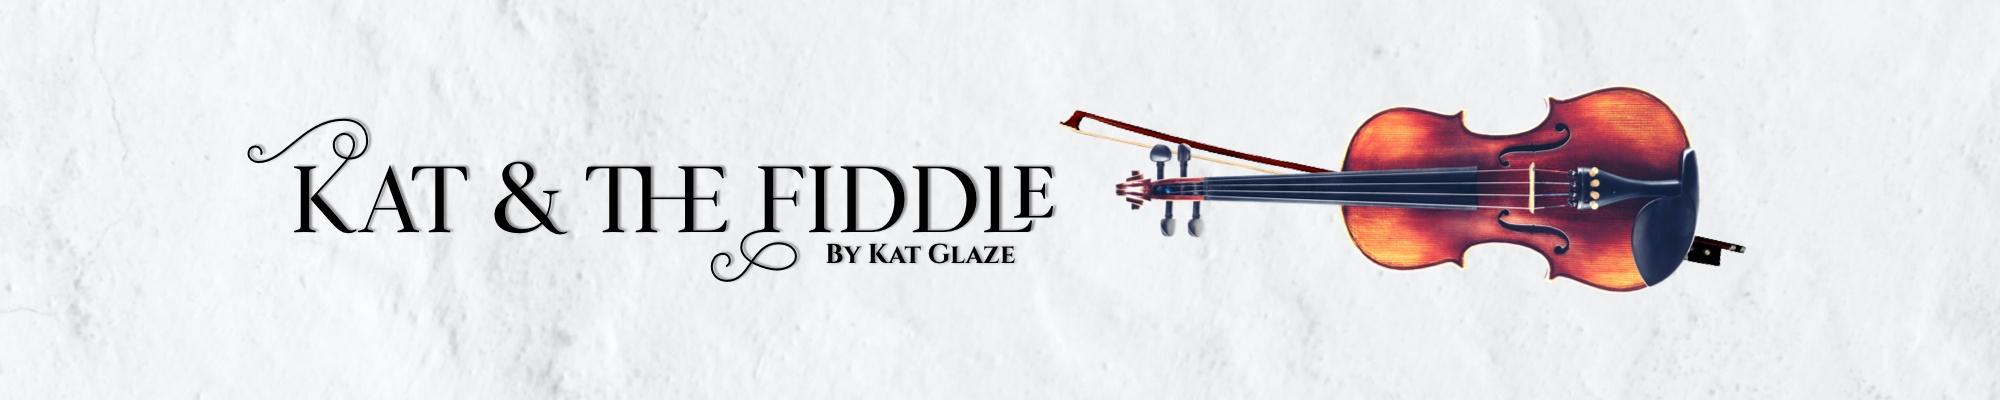 katandthefiddle Cover